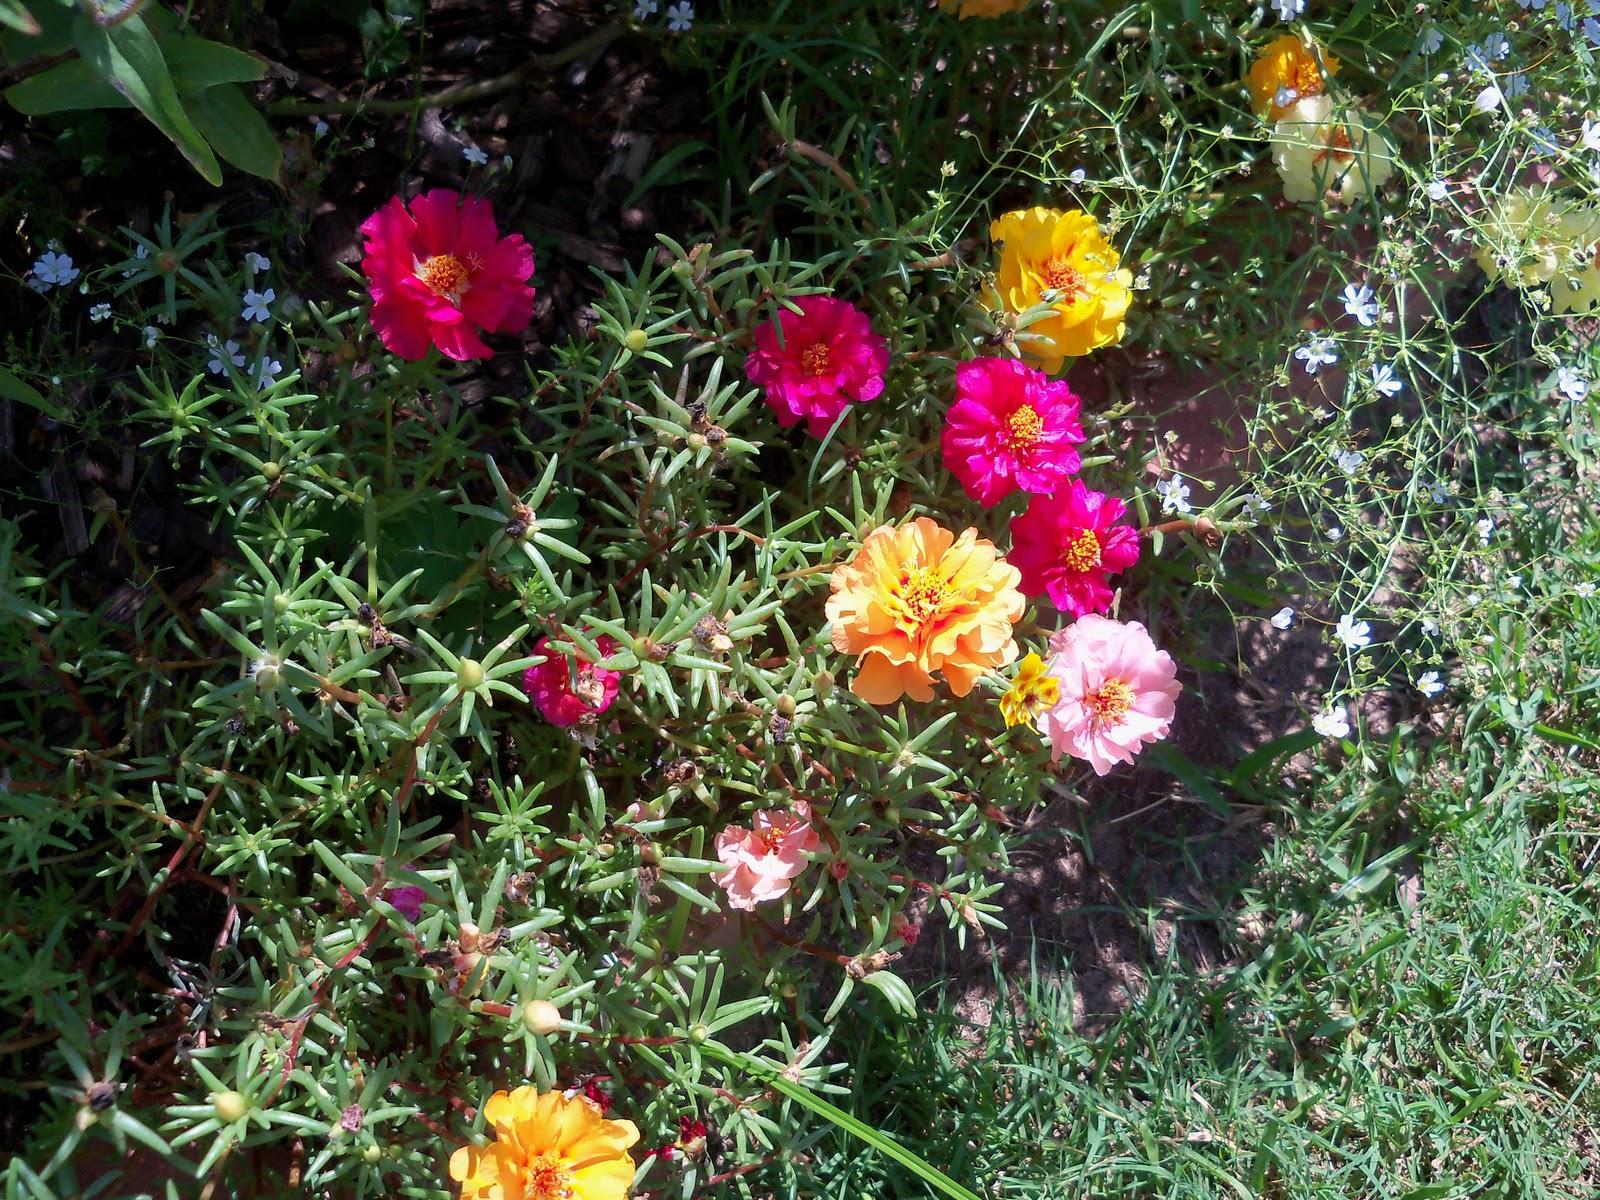 Gardening 2010, Part Three - 101_4289.JPG